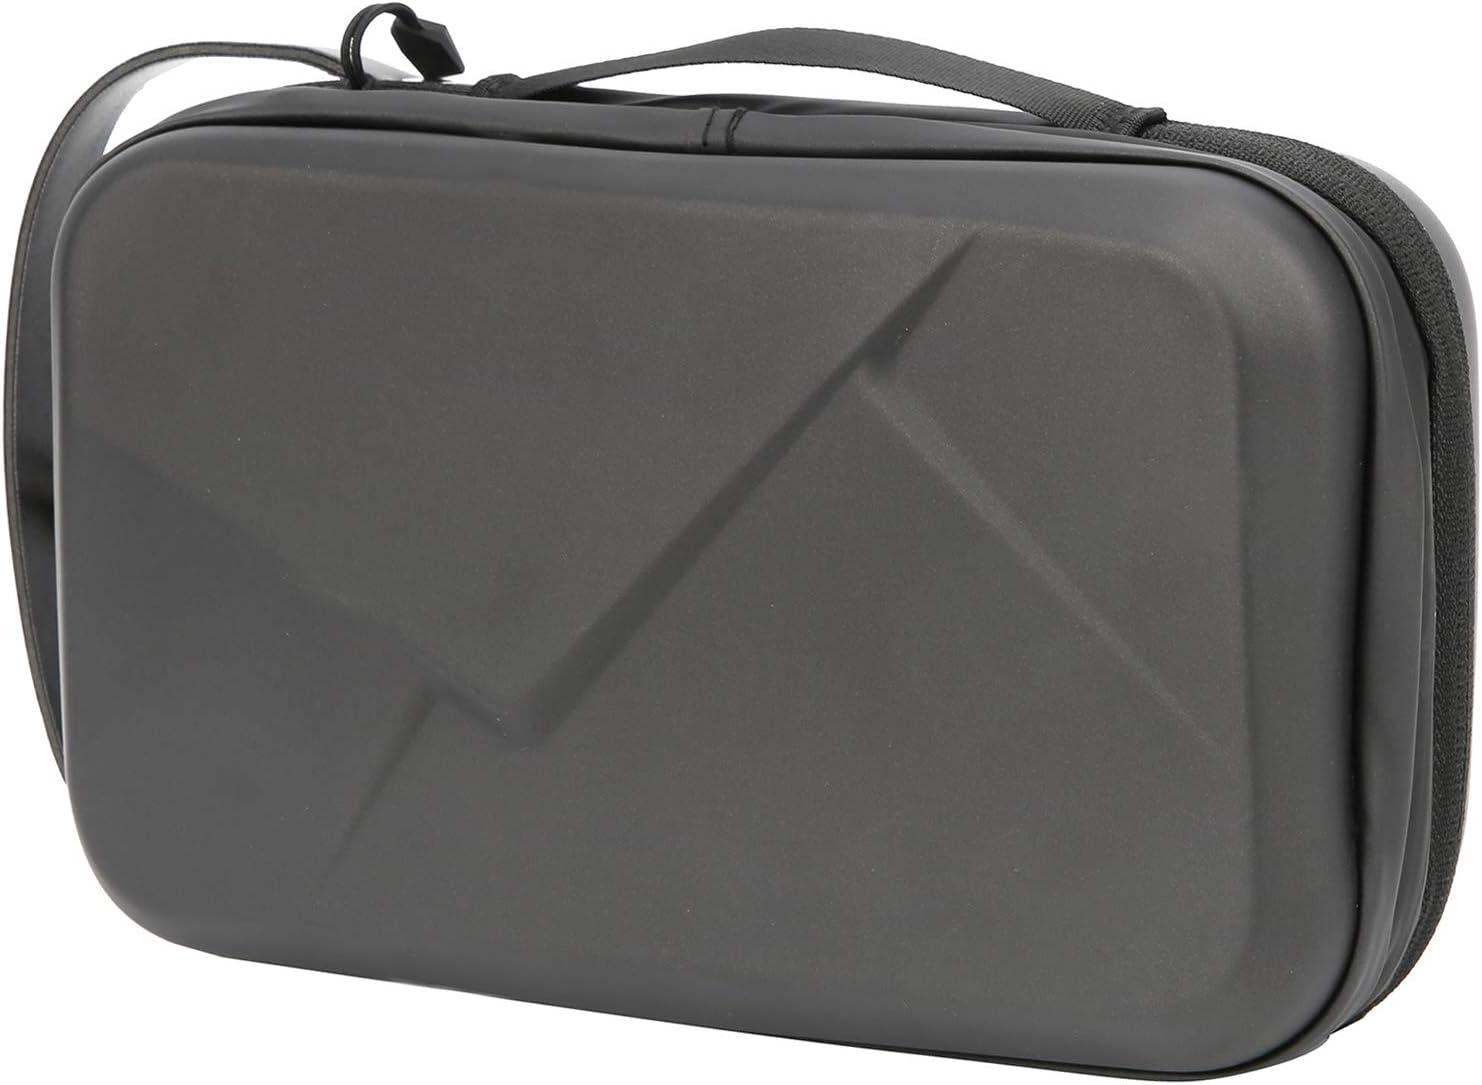 VGEBY Camera Bag Portable Multifunction Bombing new work Handbag Moti overseas Waterproof